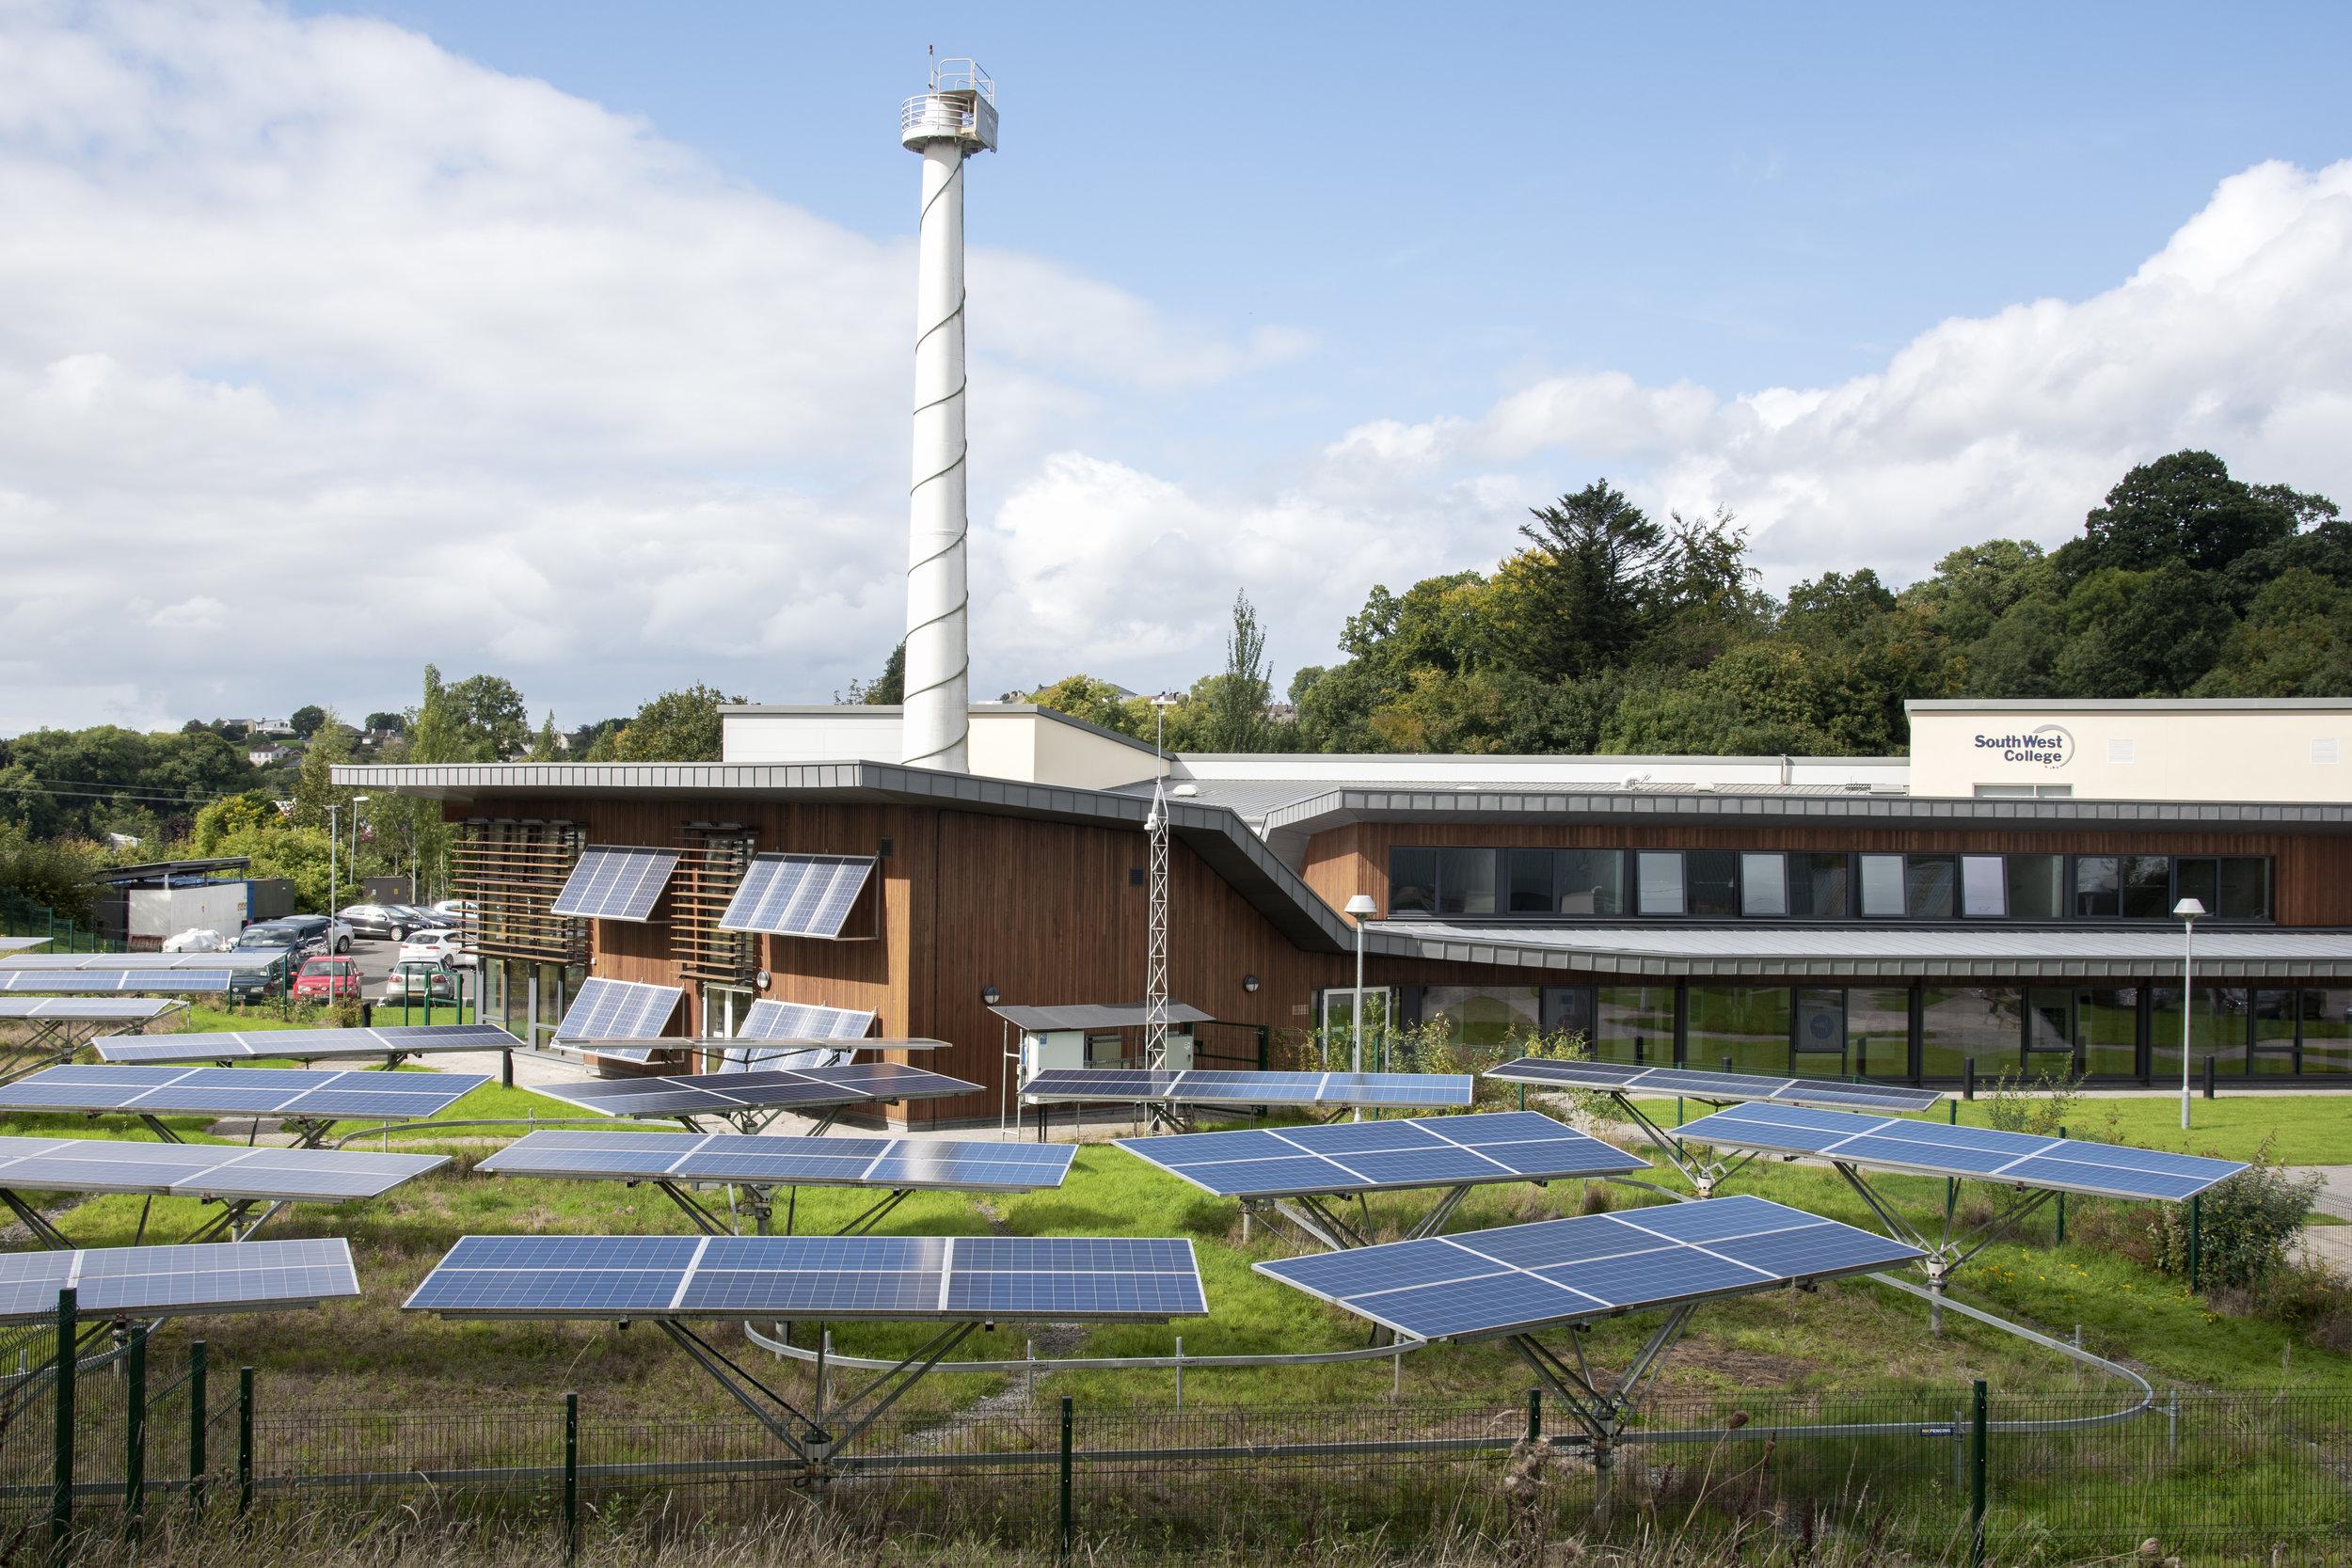 Paul_McAlister_Architects_Crest_Solar_Panels.jpg